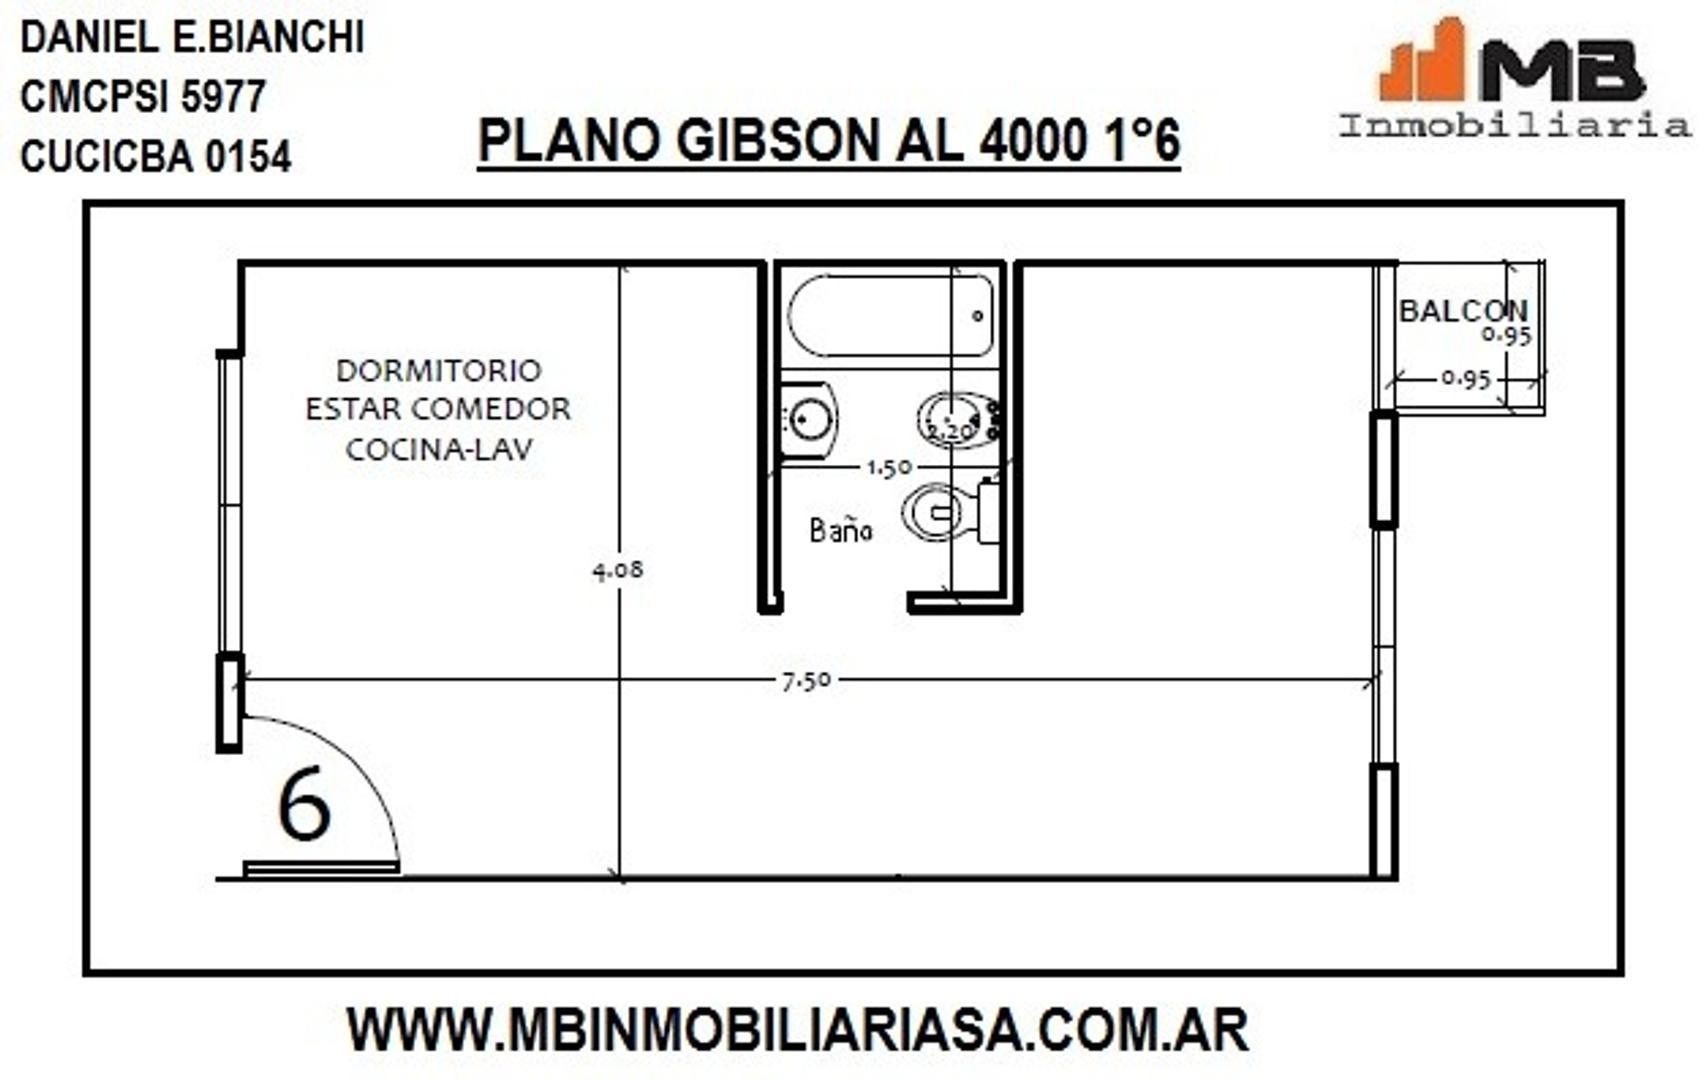 Boedo venta monoamb.en construcción c/balcón en Gibson al 4000 1°6